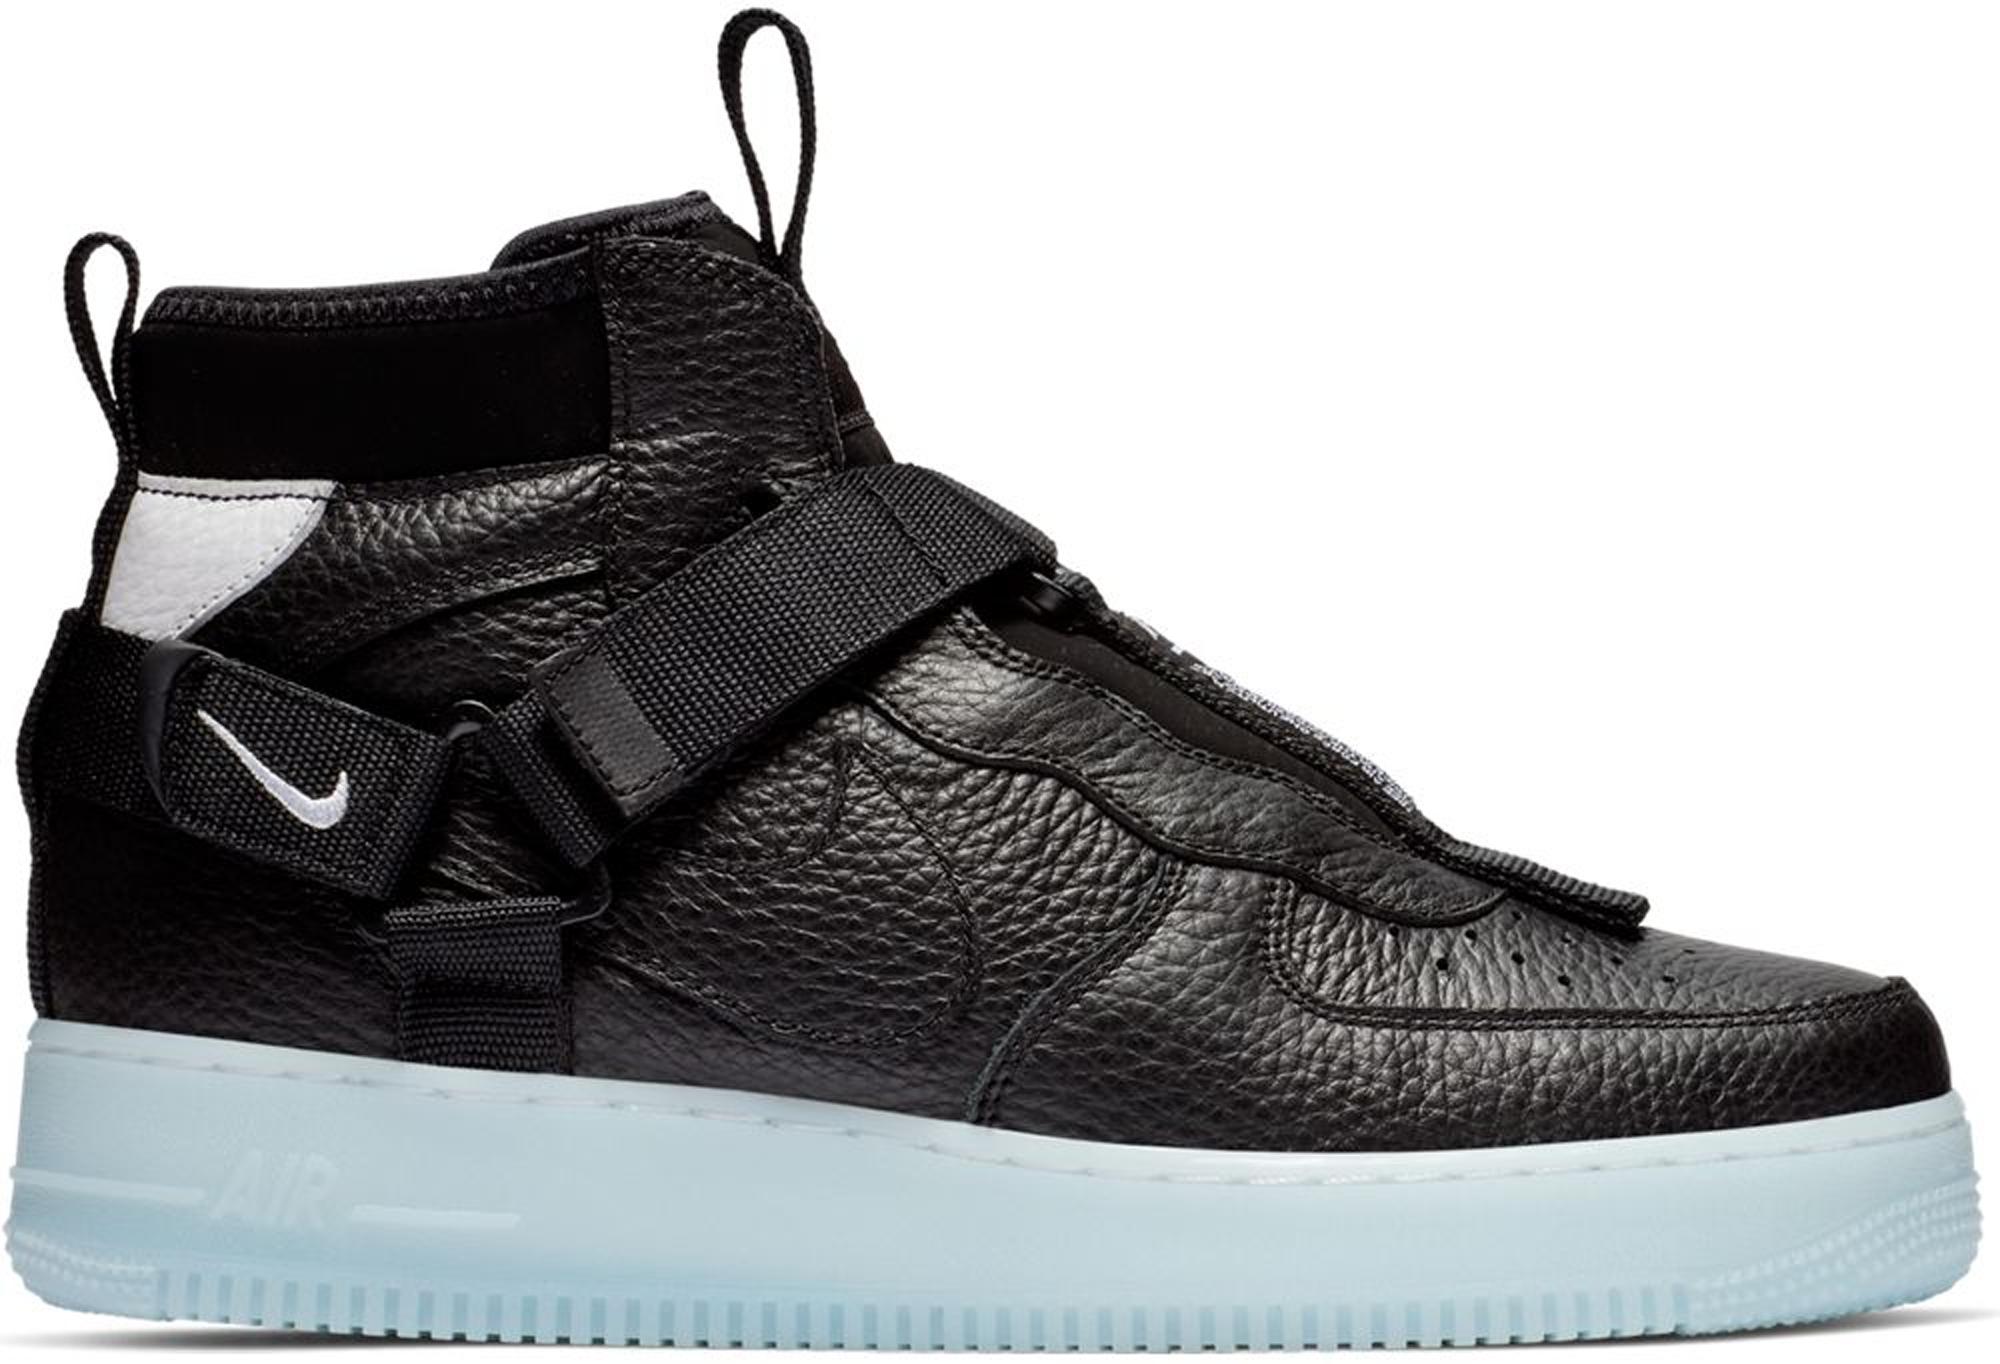 Nike Air Force 1 Mid Utility Black Half